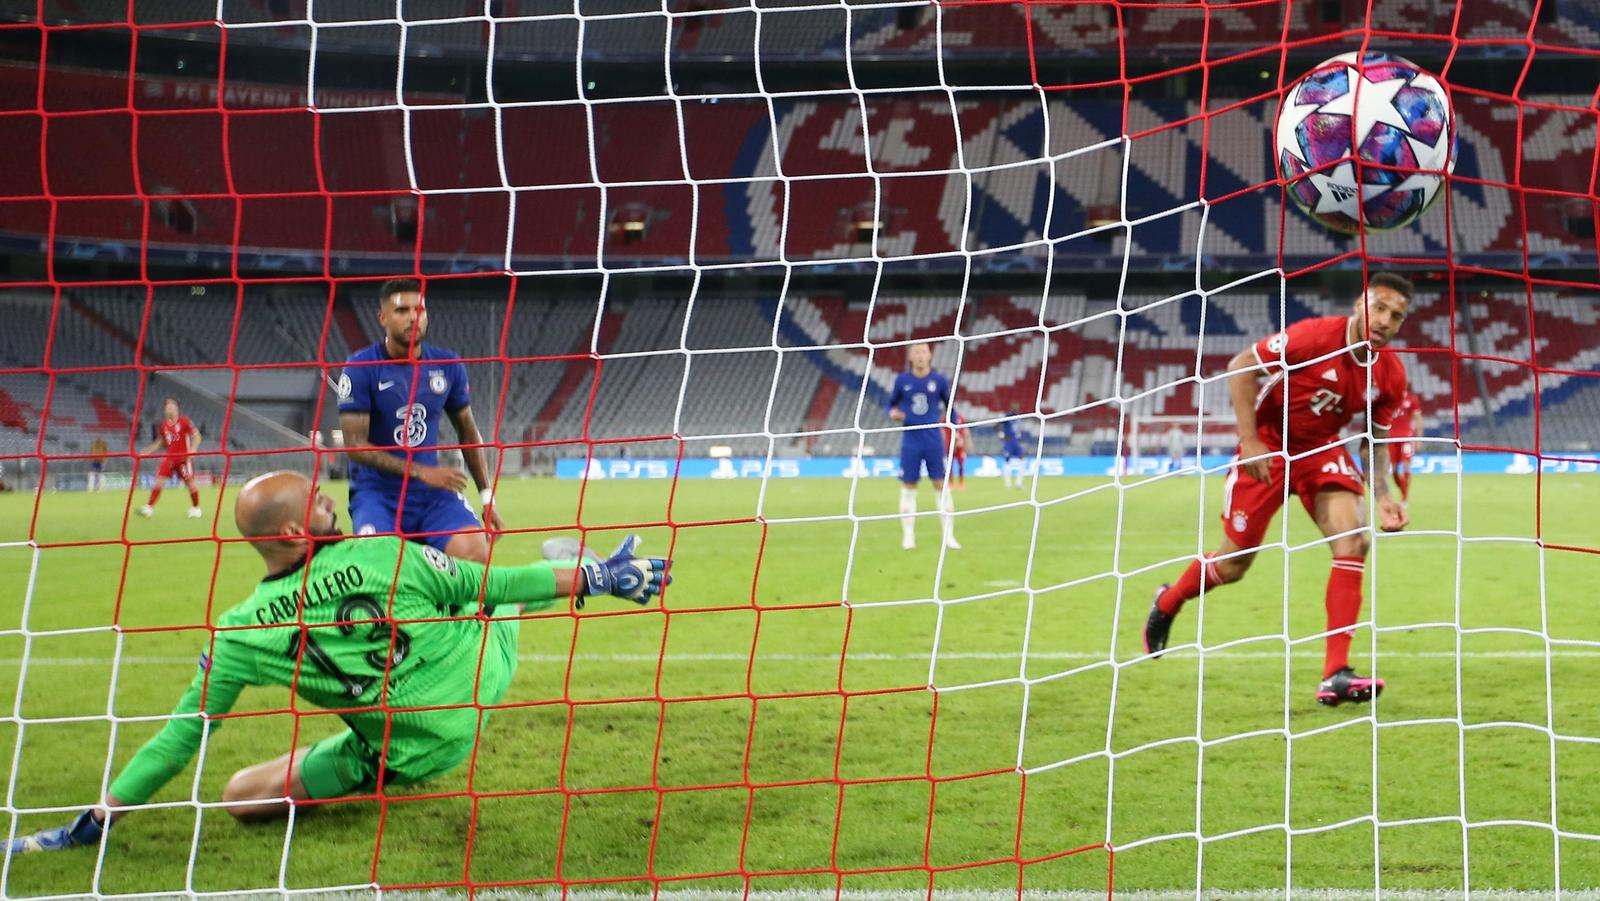 Champions League:Bayern Wins Chelsea to set up Barca quarter-final